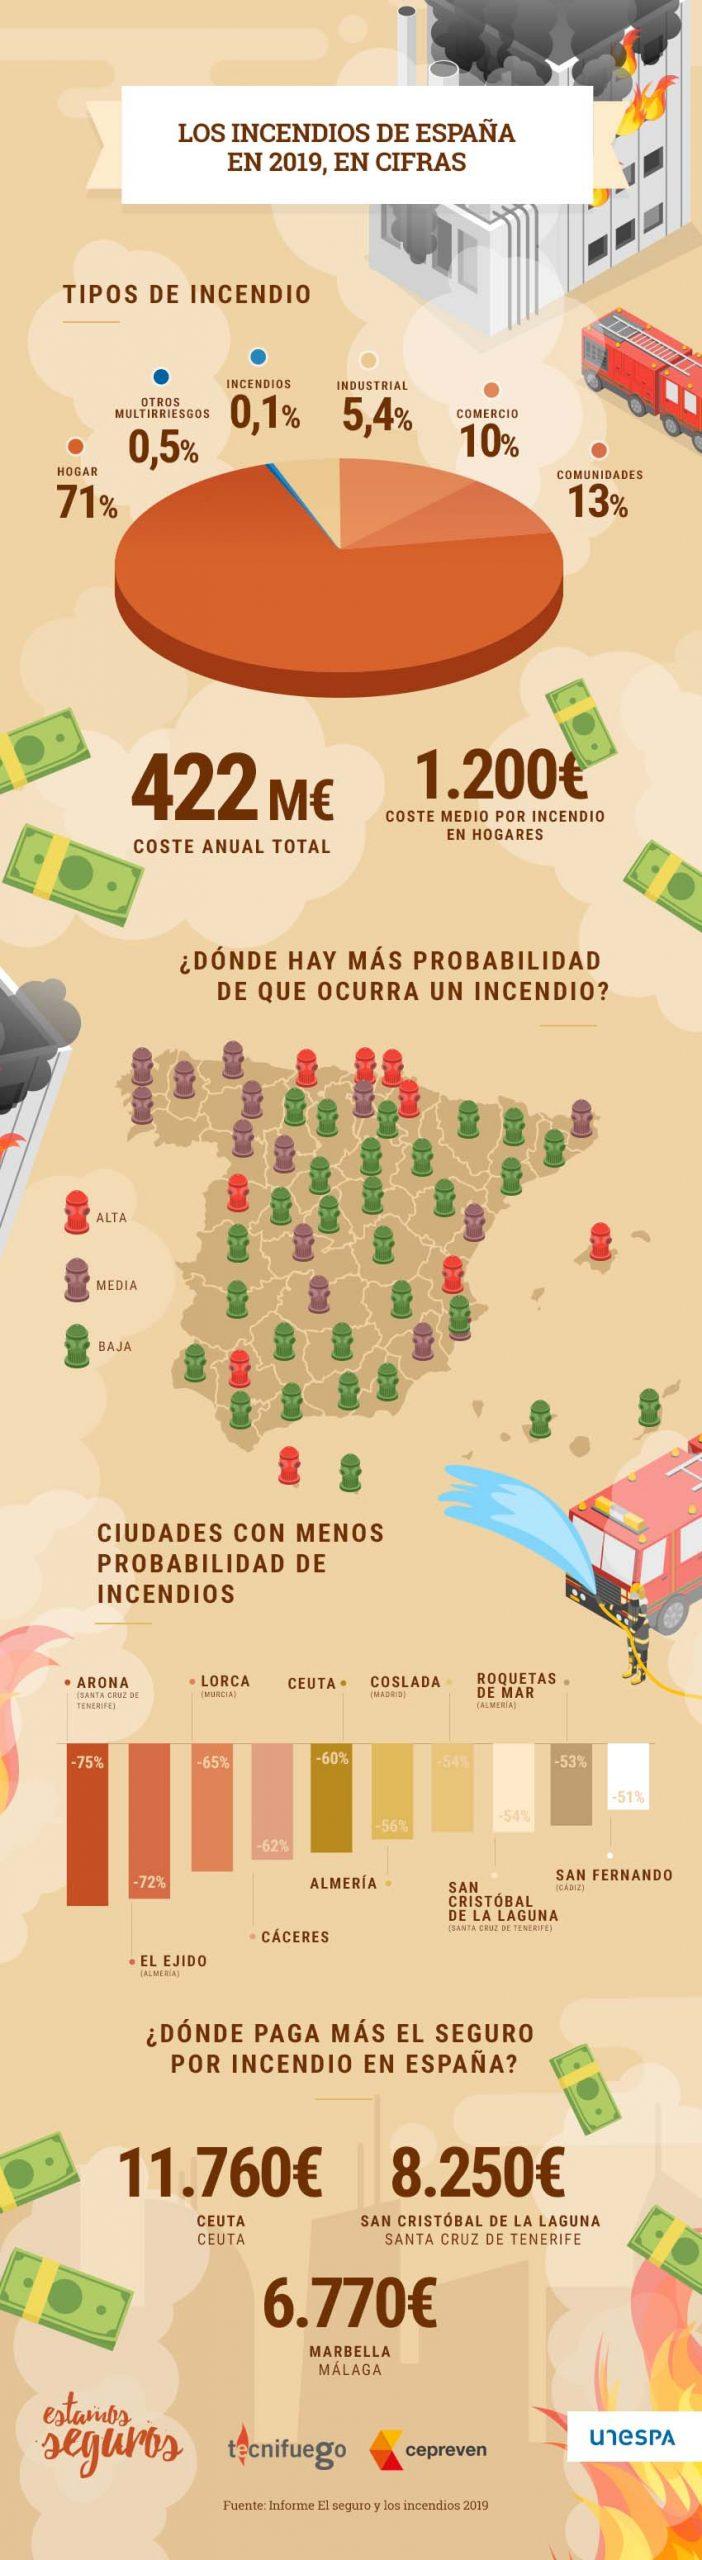 Incendios en España 2019